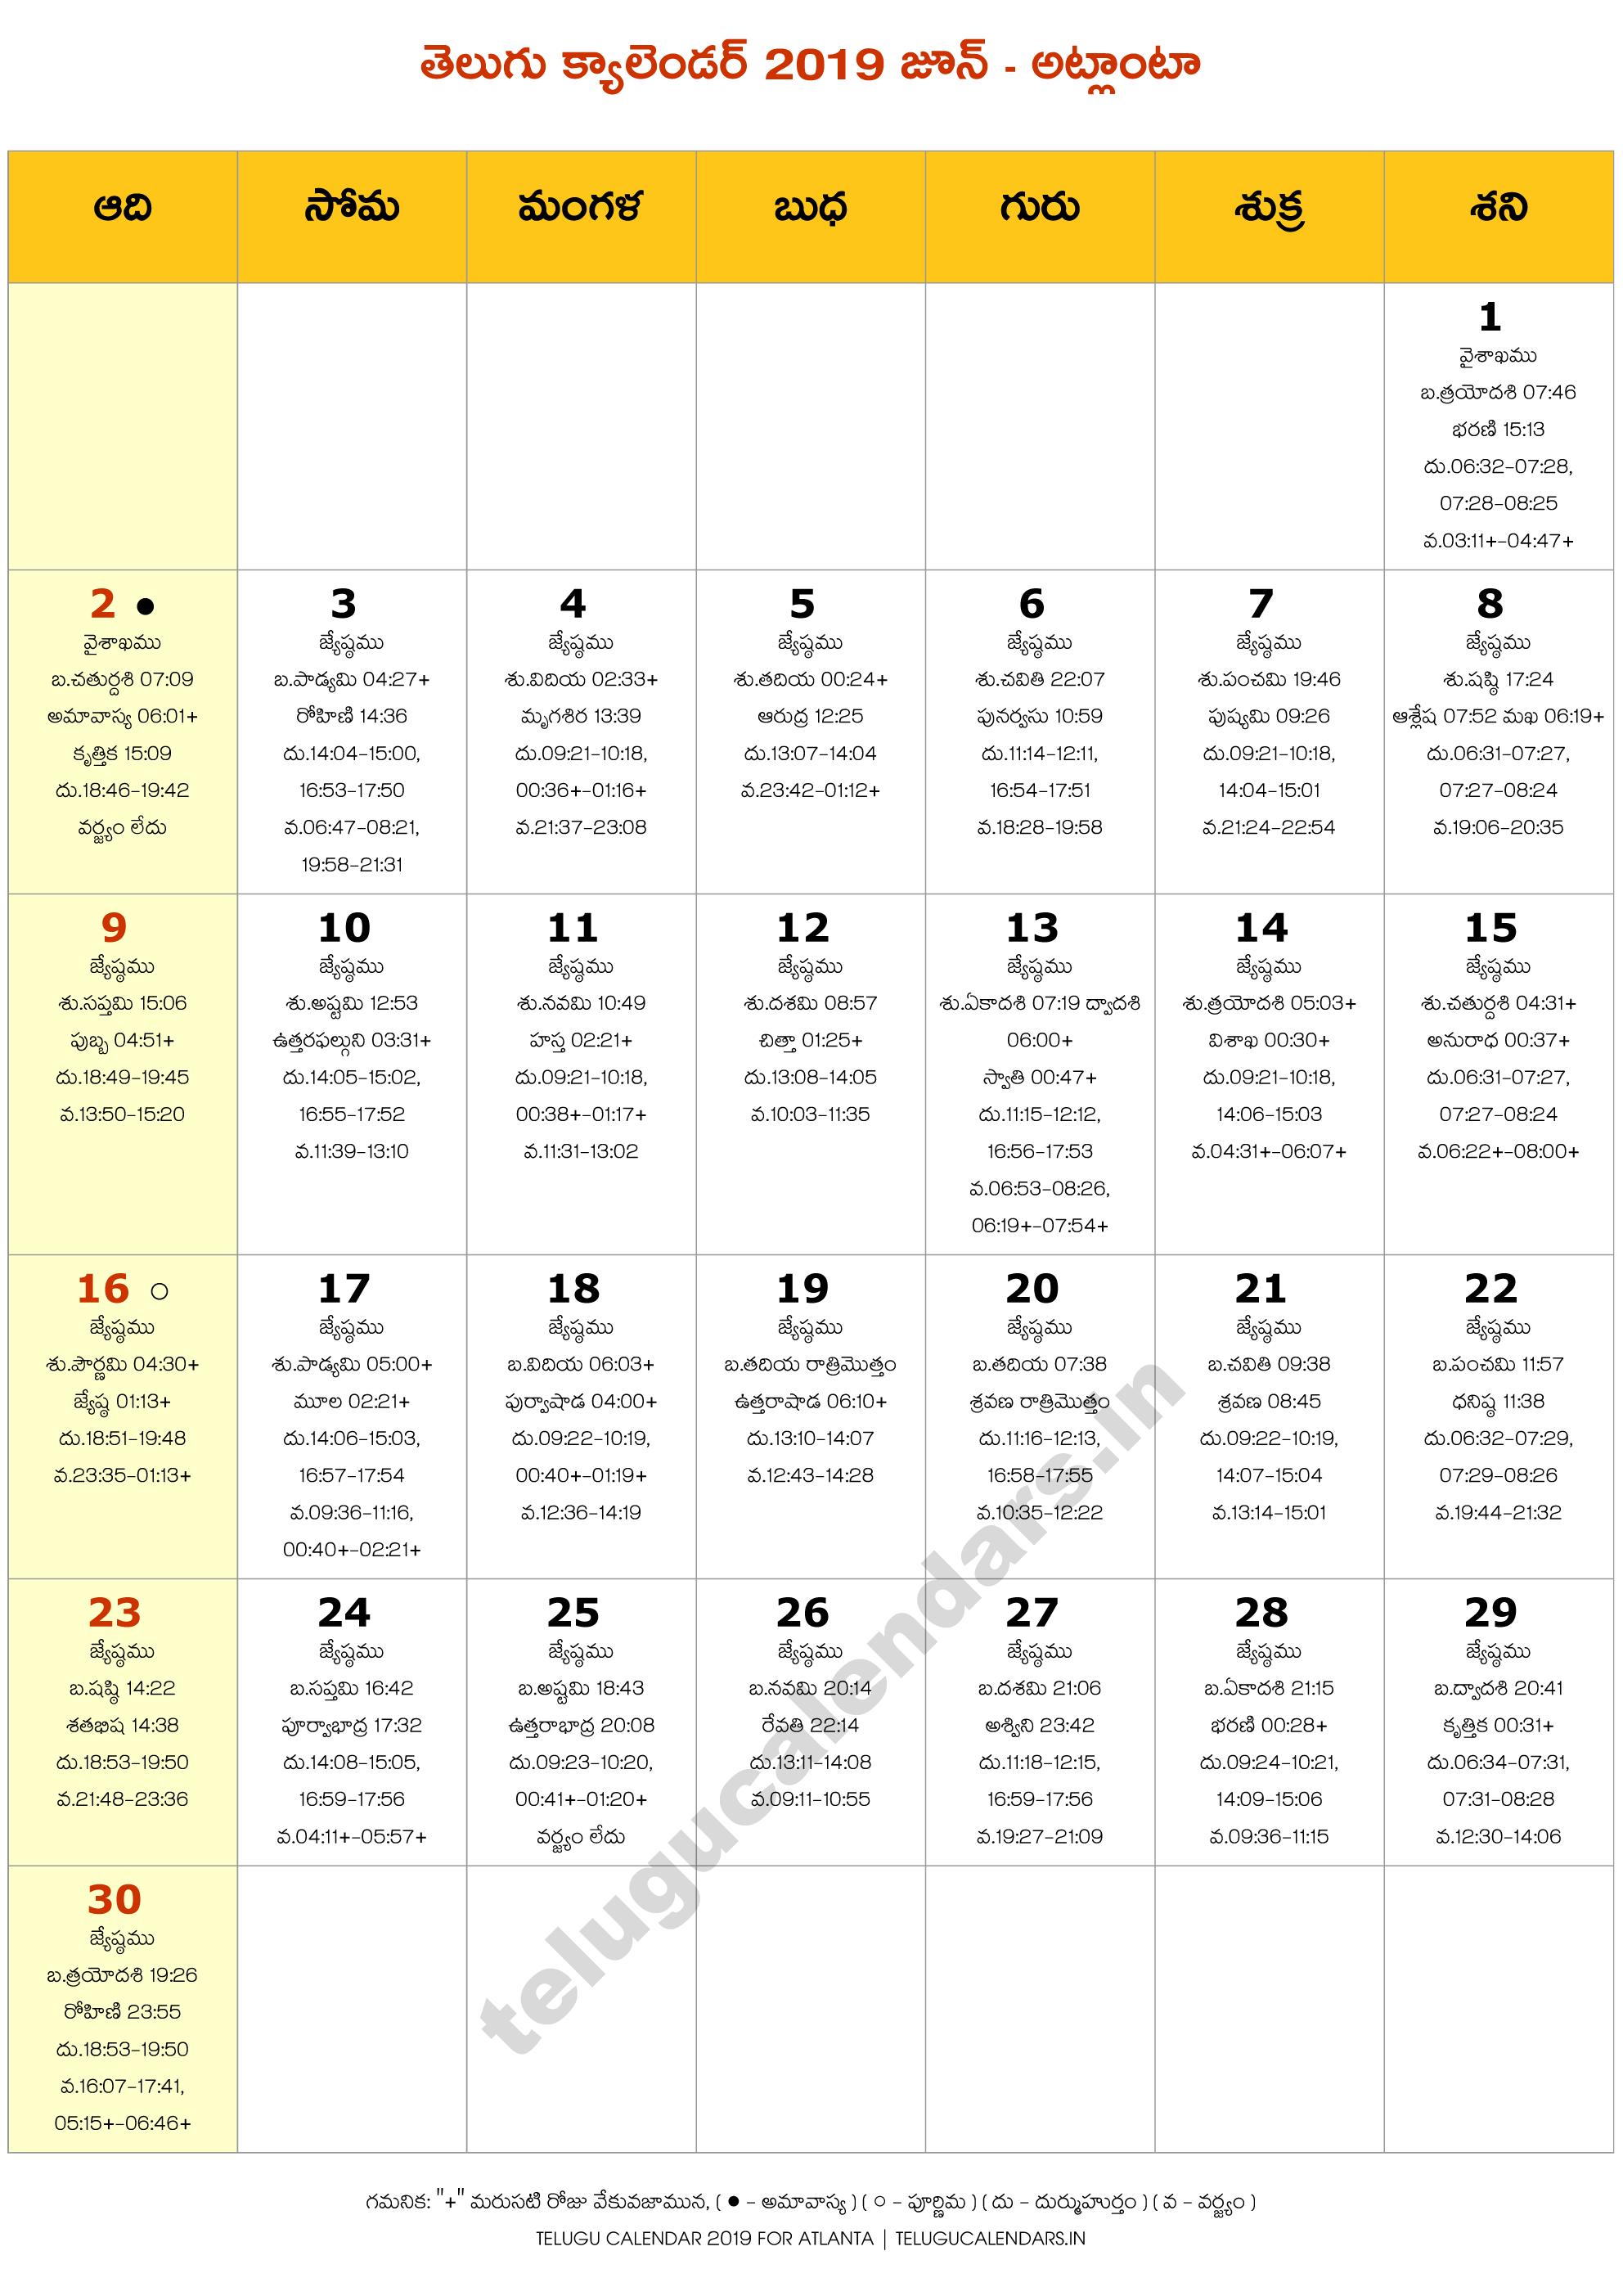 JULY 1 2018 TELUGU CALENDAR - 2019 Auspicious Days for Your